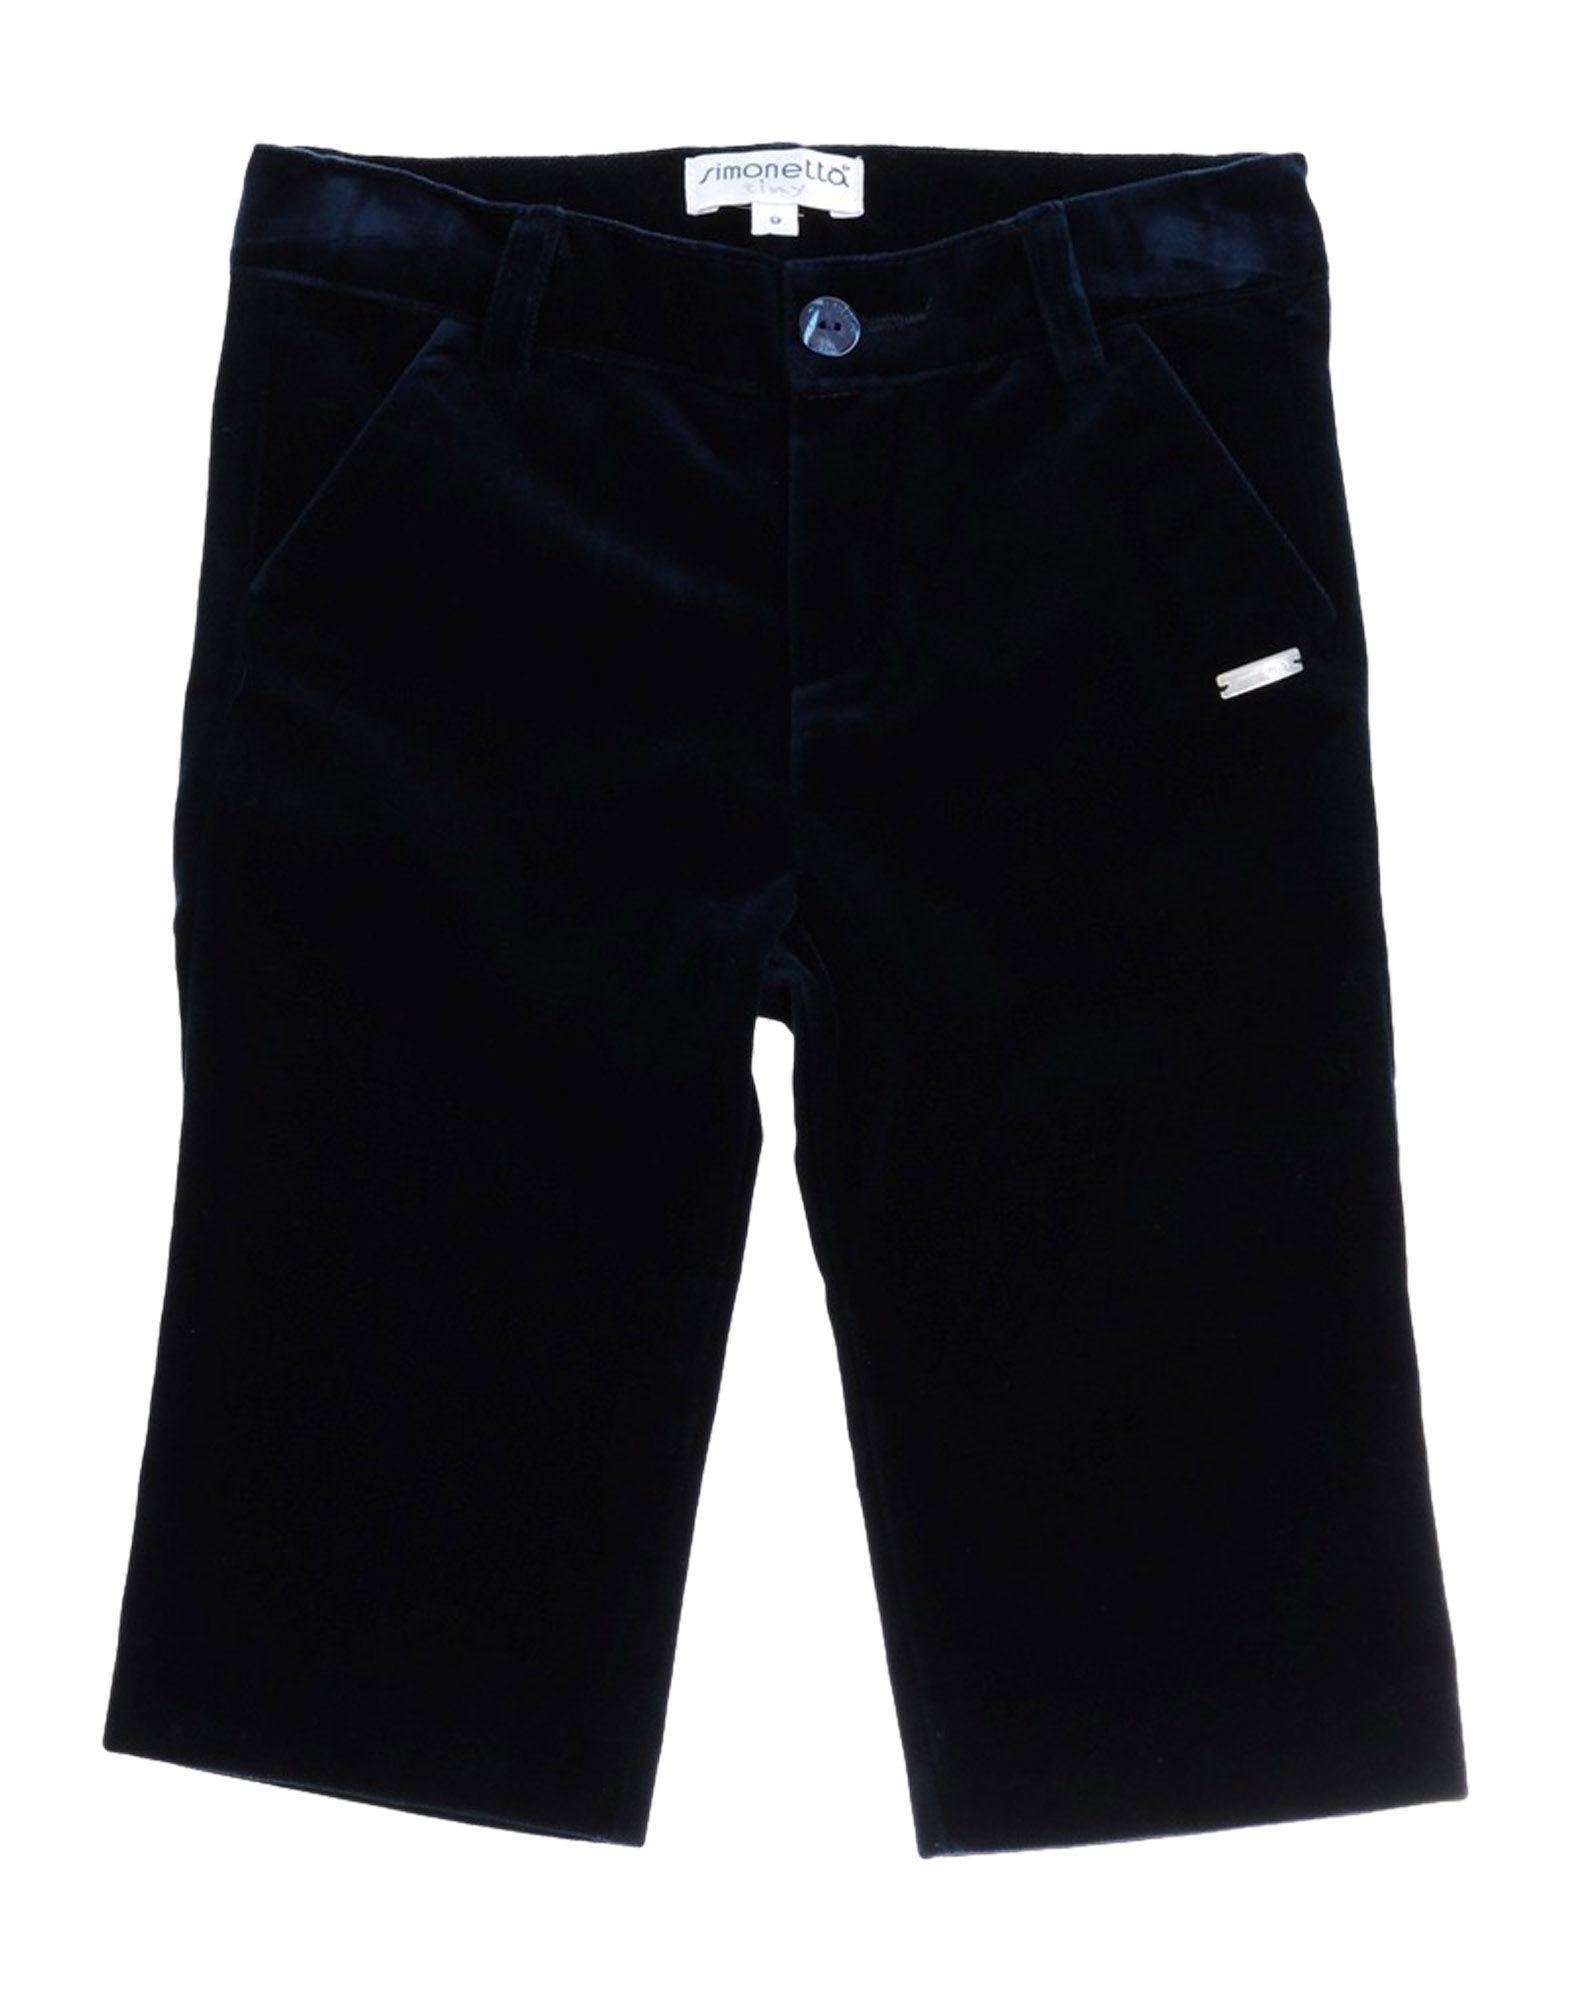 TROUSERS Simonetta Tiny Dark blue Boy Cotton